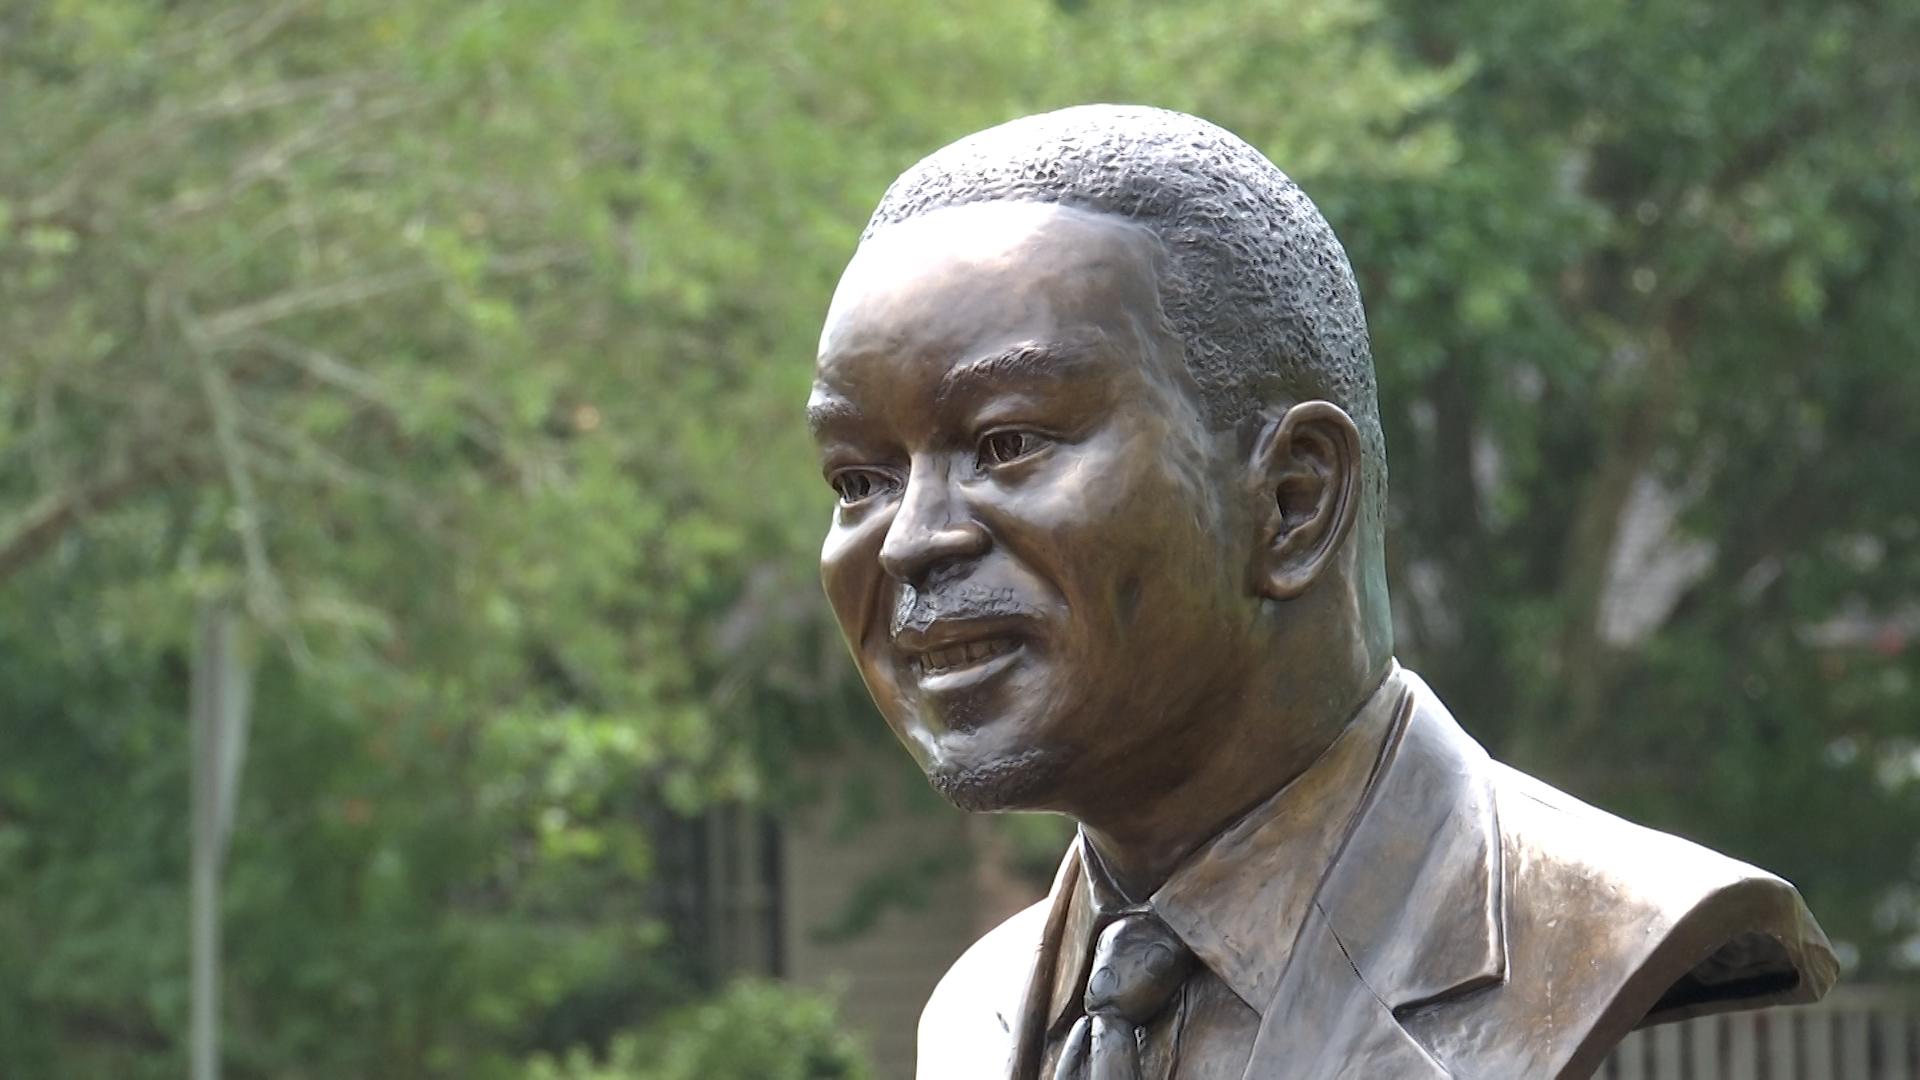 Sen. Clementa Pinckney memorialized at Amazing Grace Park opening in Marion